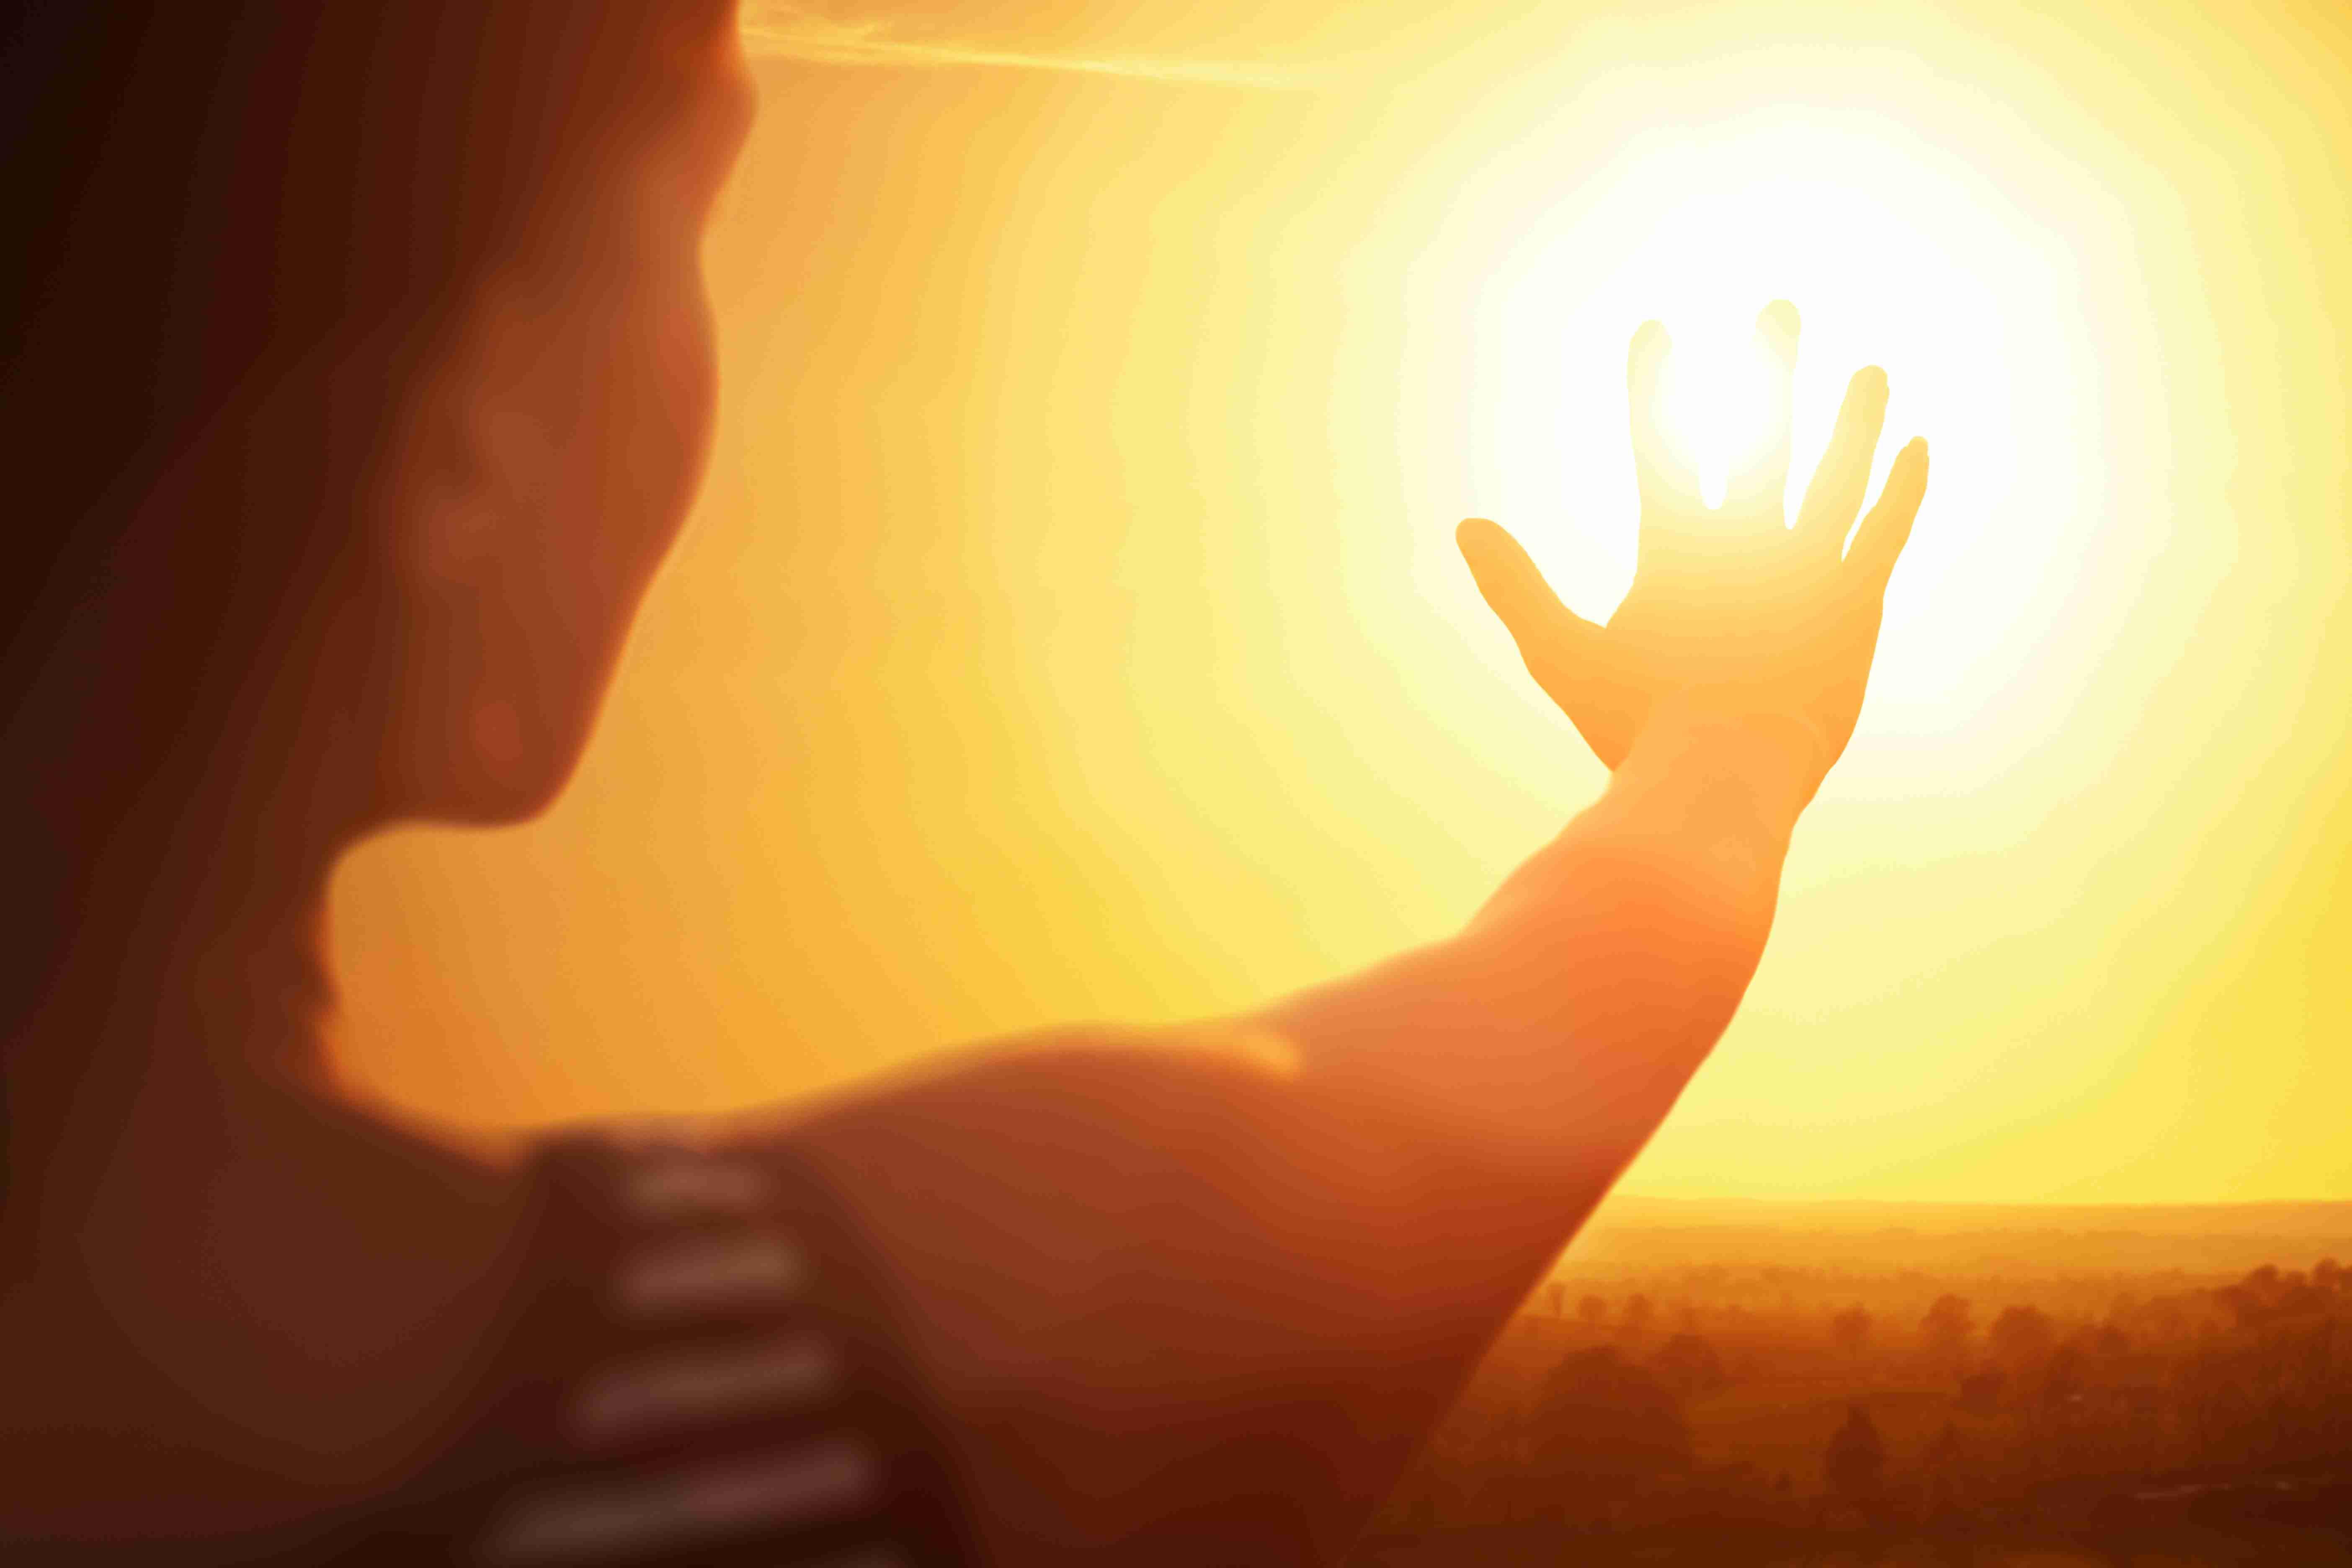 Woman reaching for the sun.